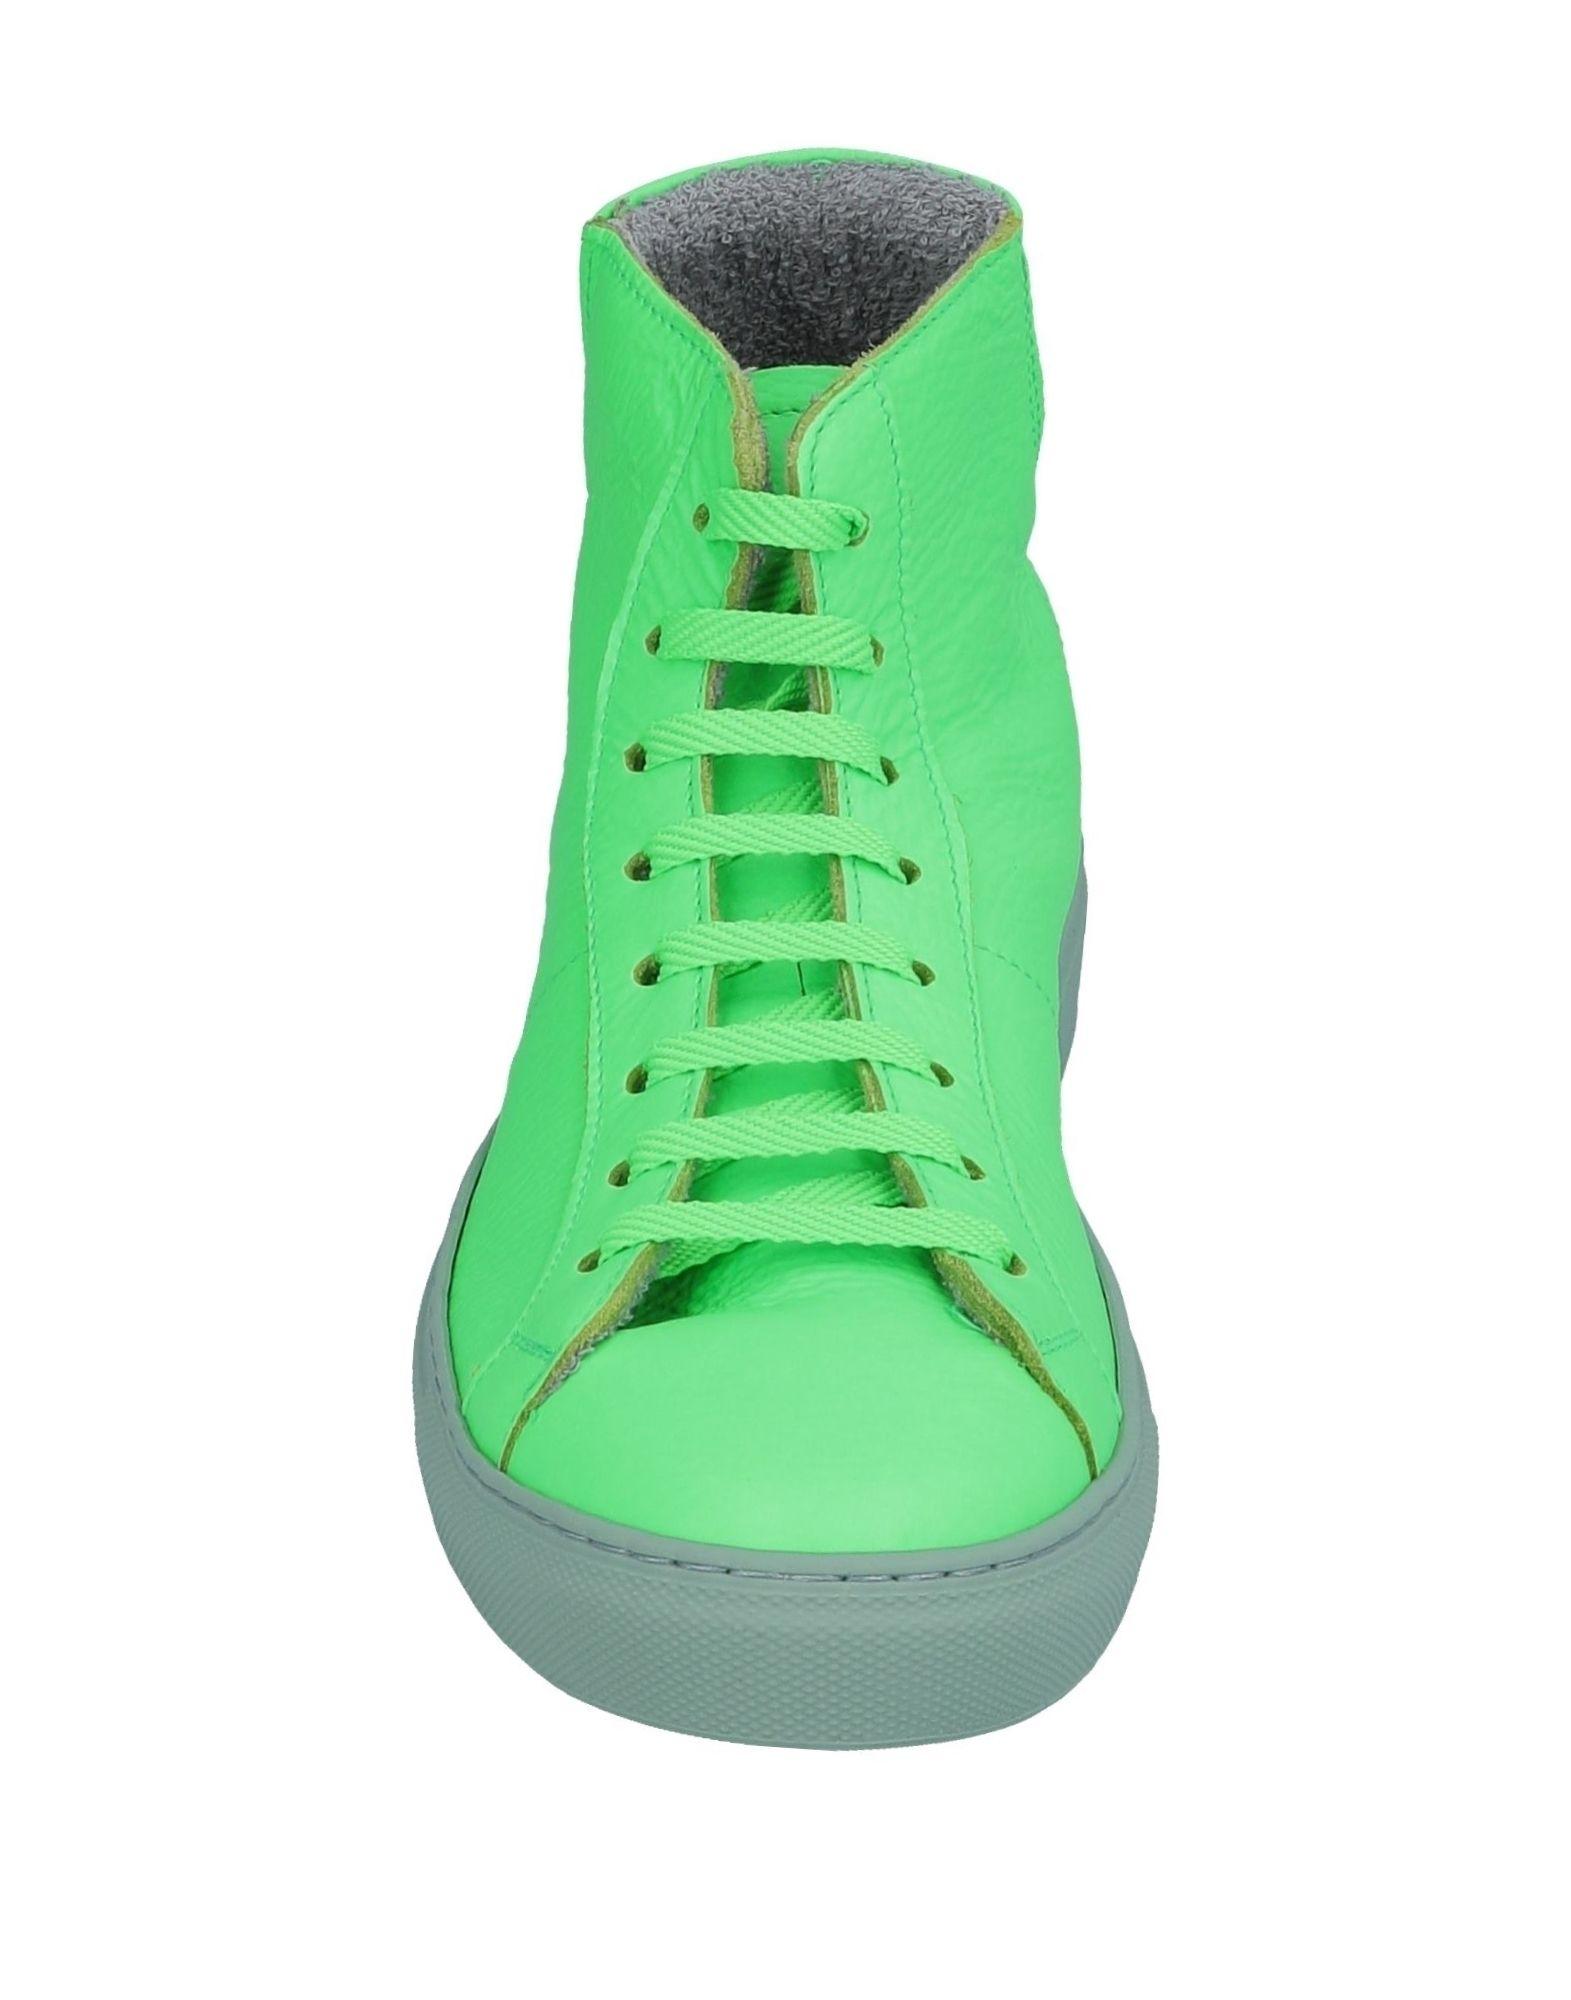 Antony Morato Sneakers Sneakers Sneakers - Men Antony Morato Sneakers online on  Australia - 11548751VD 847e2f